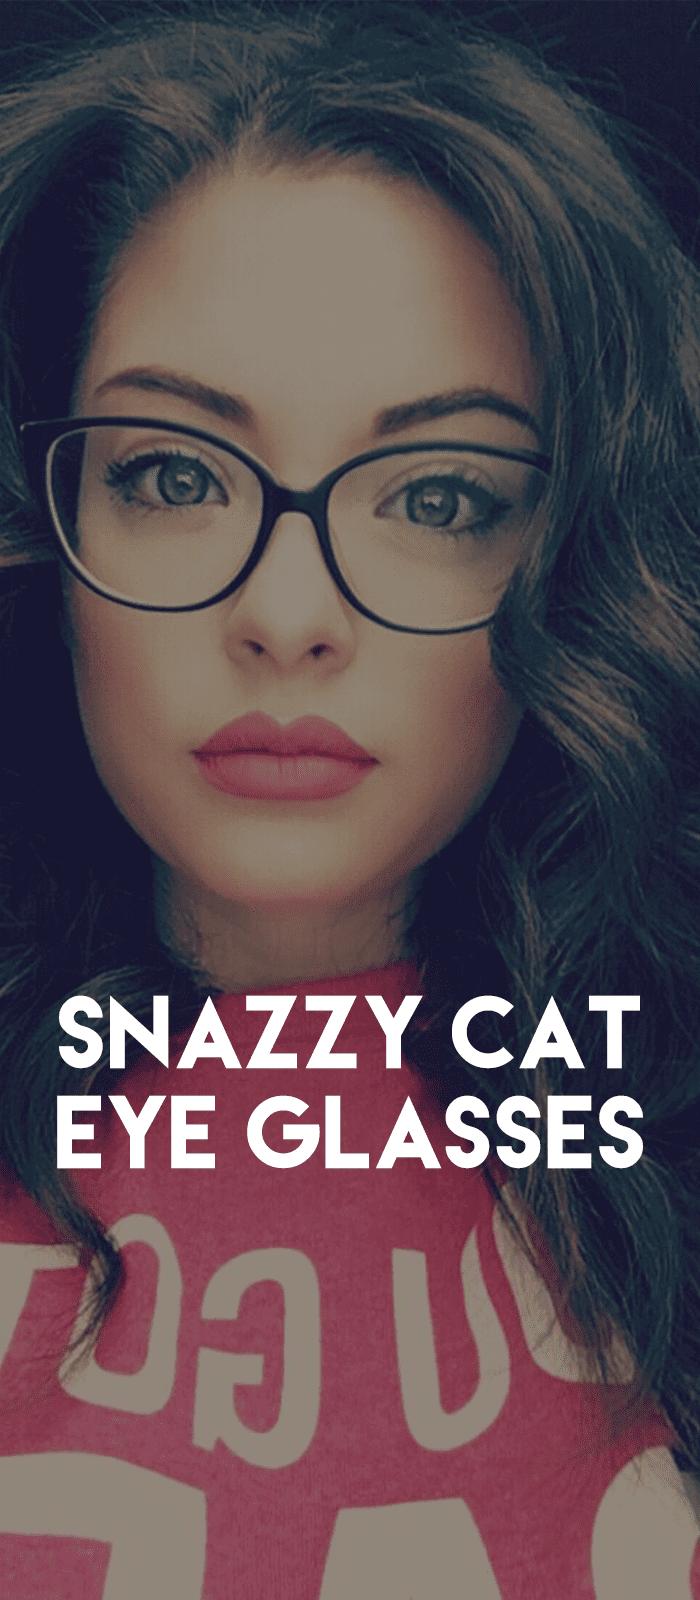 Snazzy Cat Eye Glasses